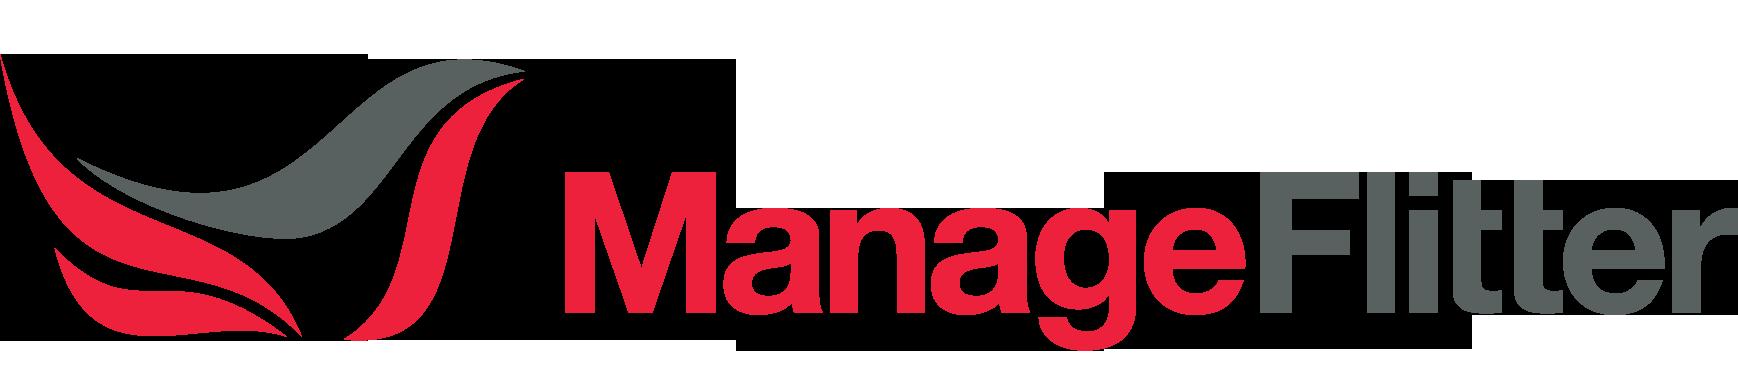 ManageFlitter - Twitter Management Tool | Work Faster & Smarter